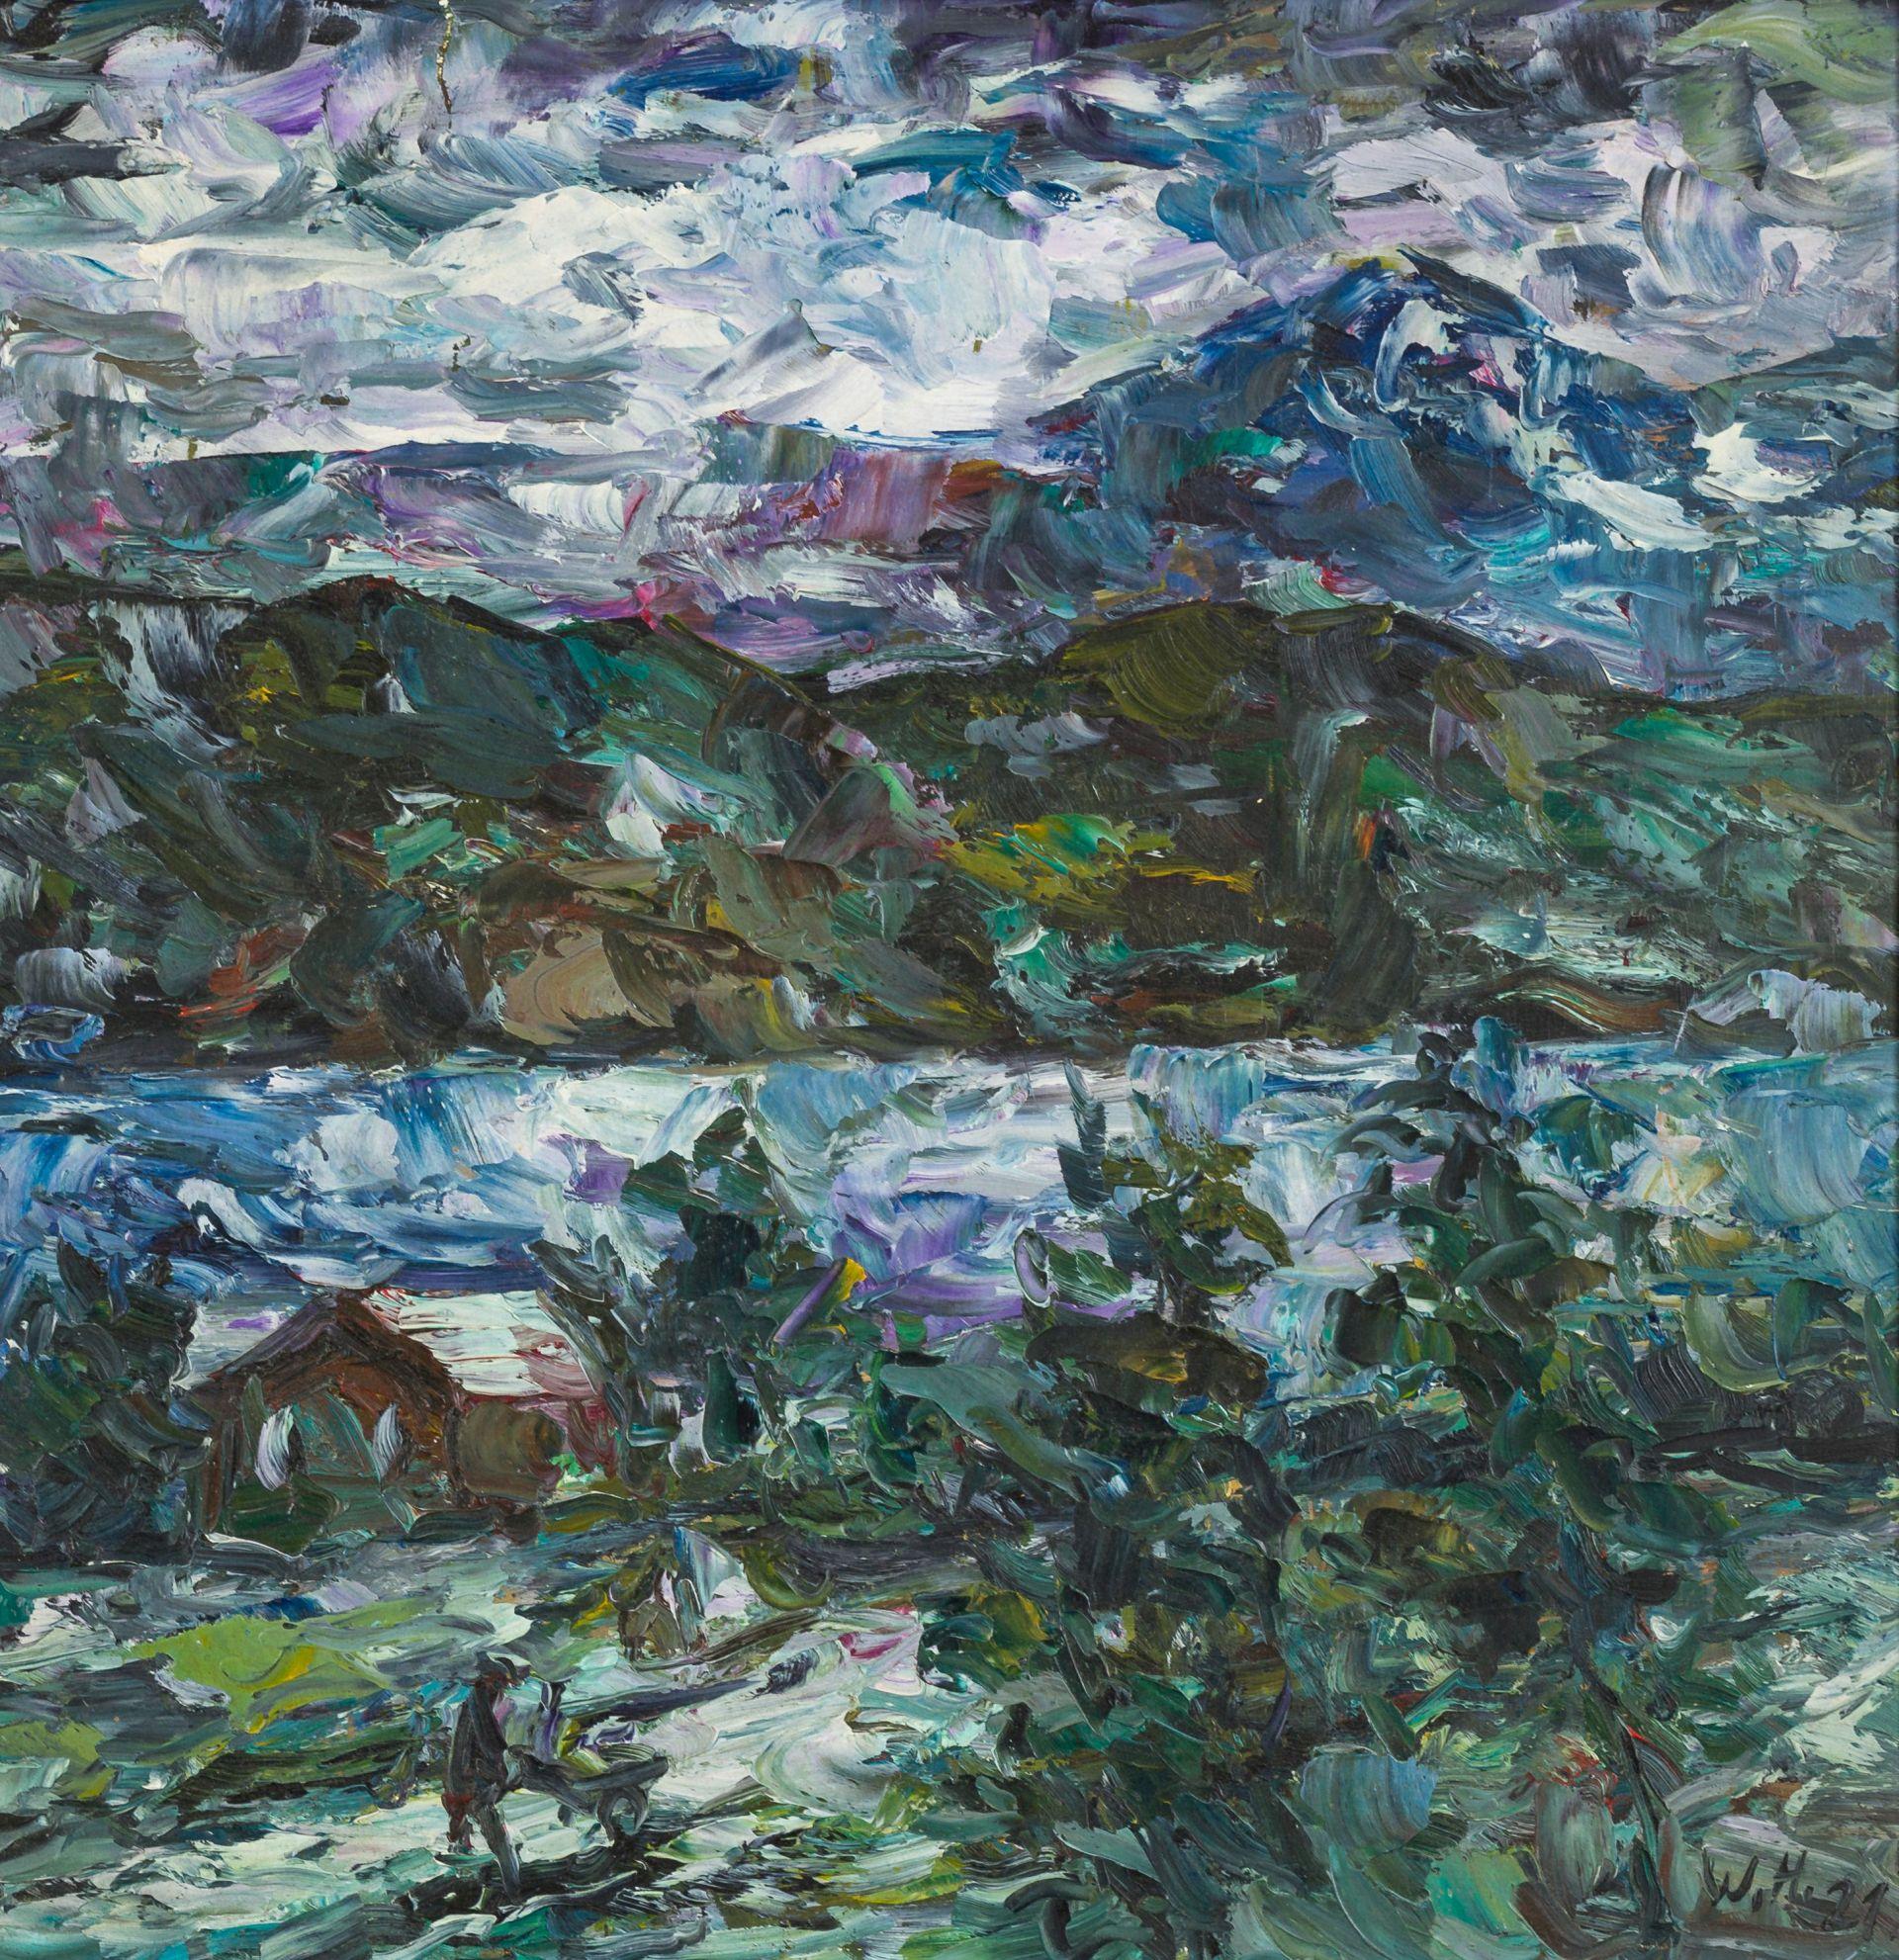 Wolf Hoffmann-Mountain landscape